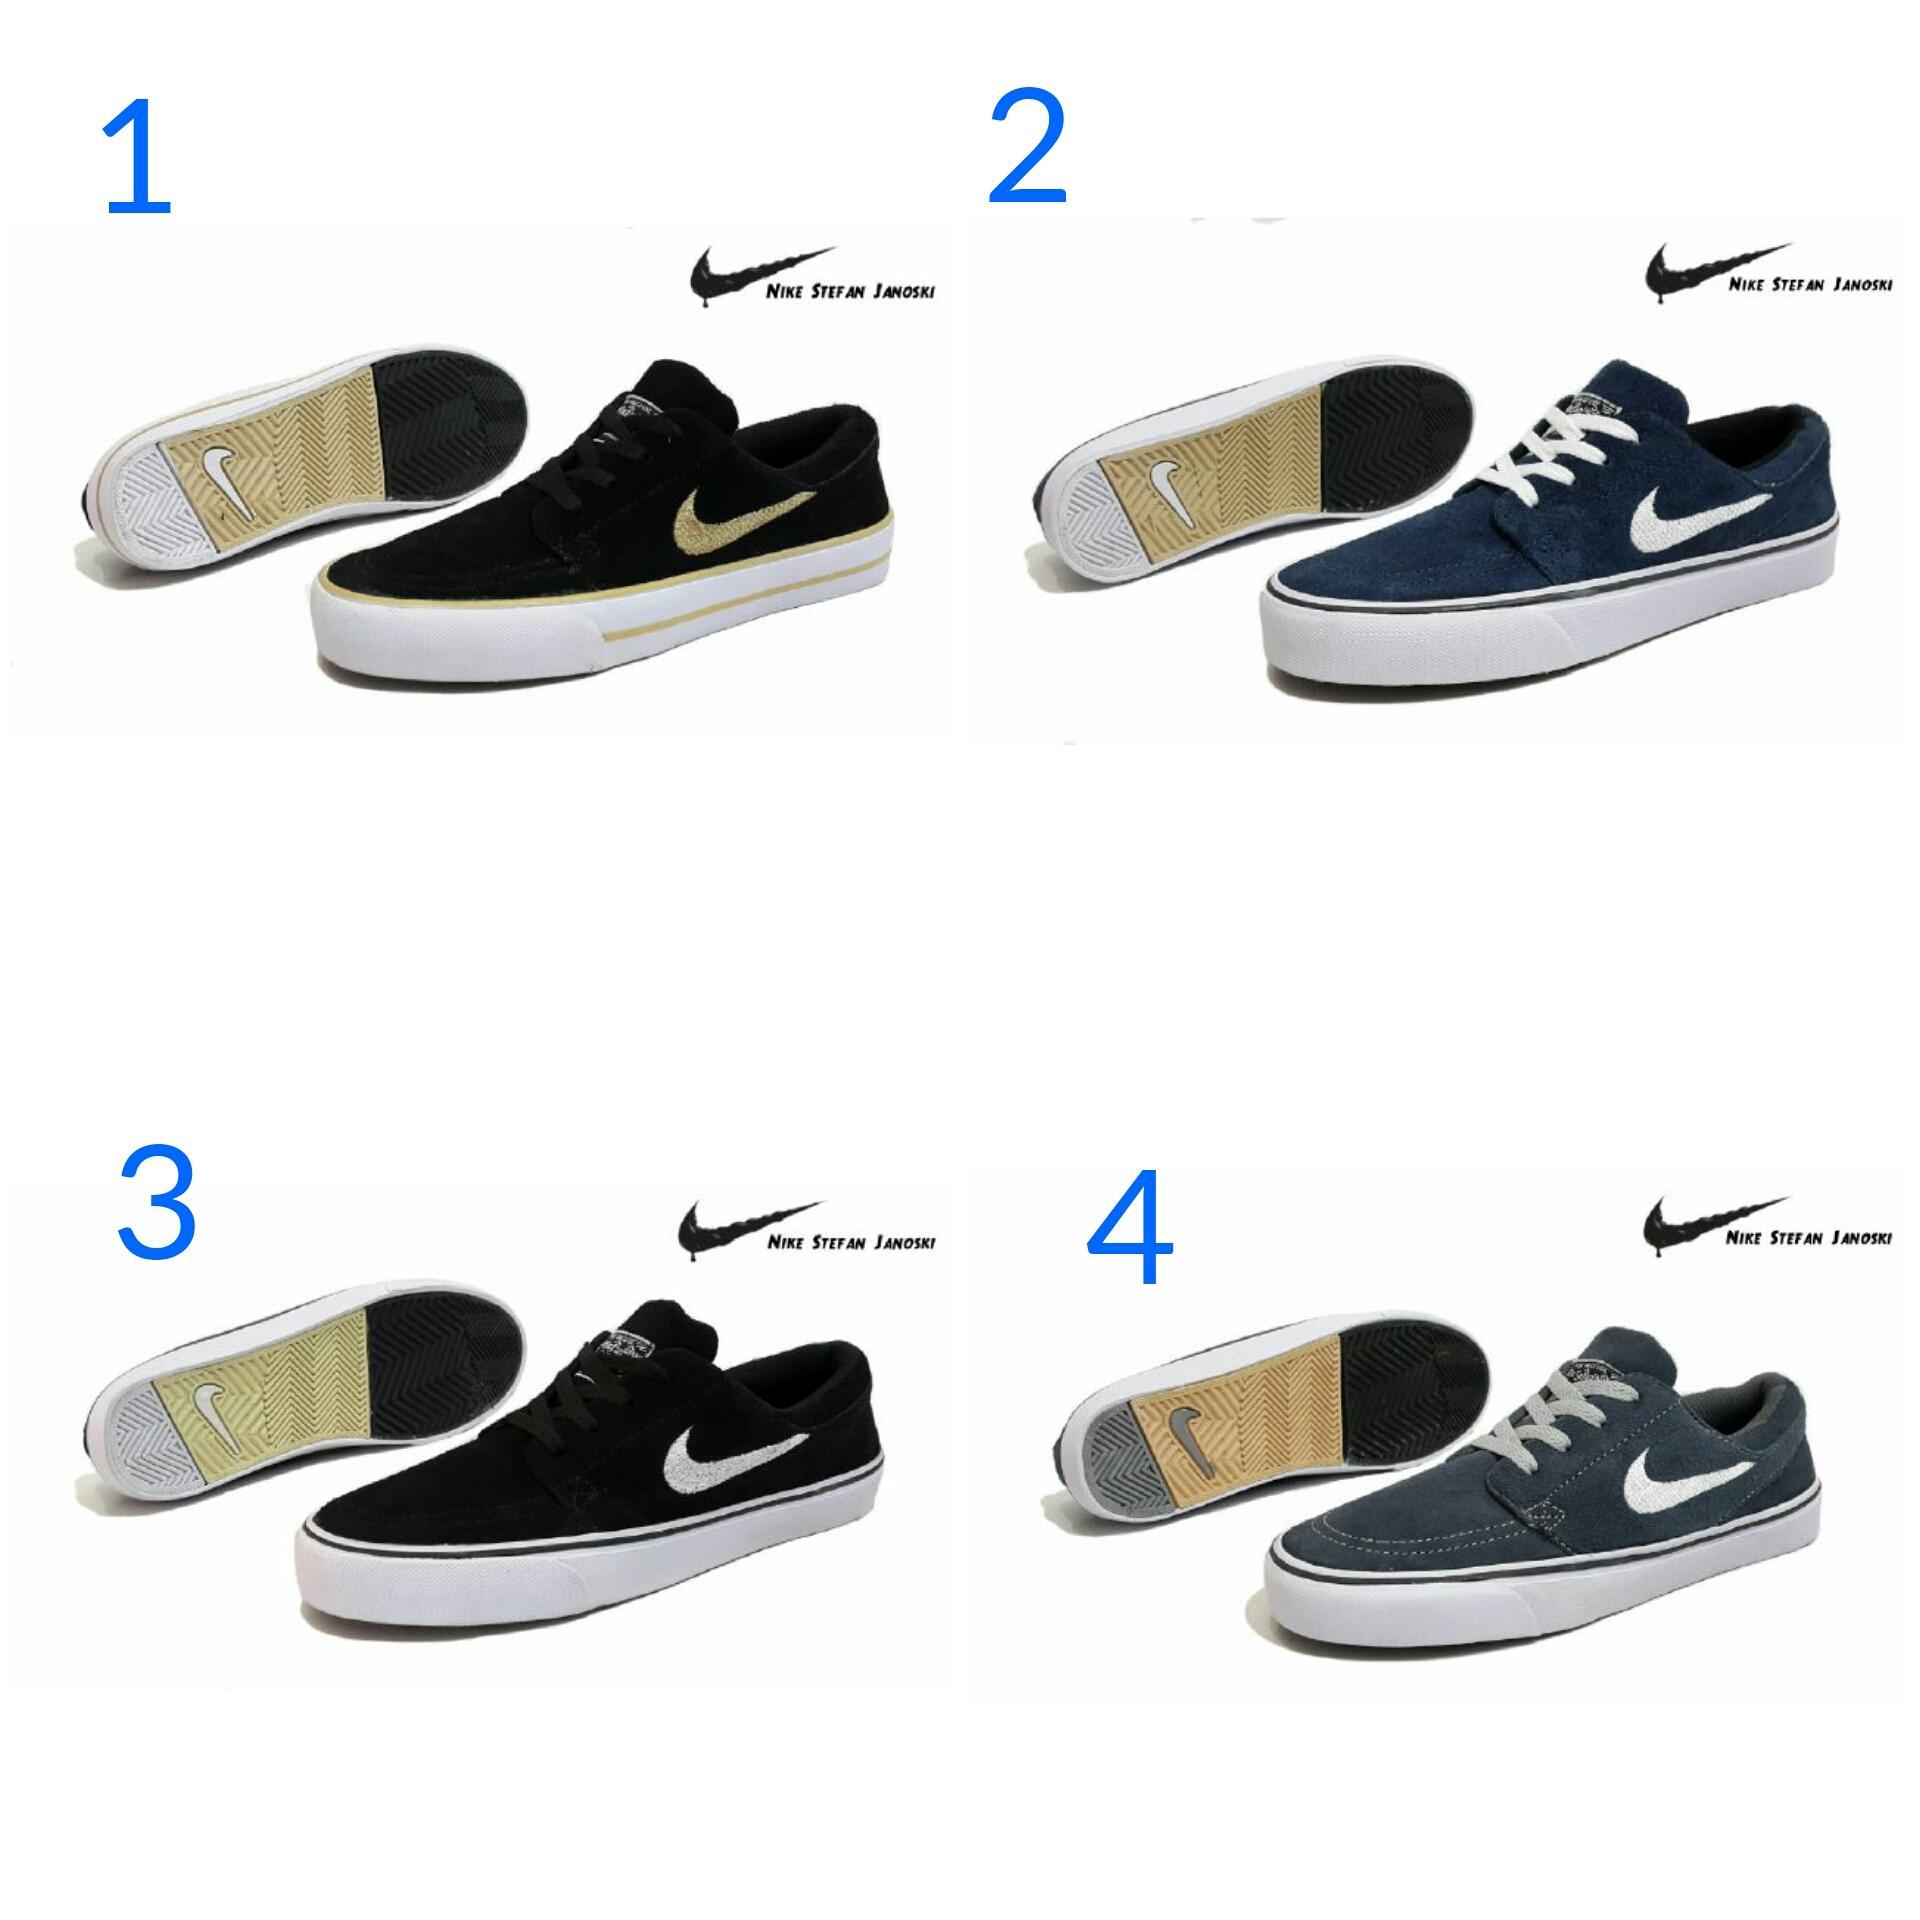 Promo Sepatu Murah Nike Janosky Original Vietnam Sepatu Pria Diskon